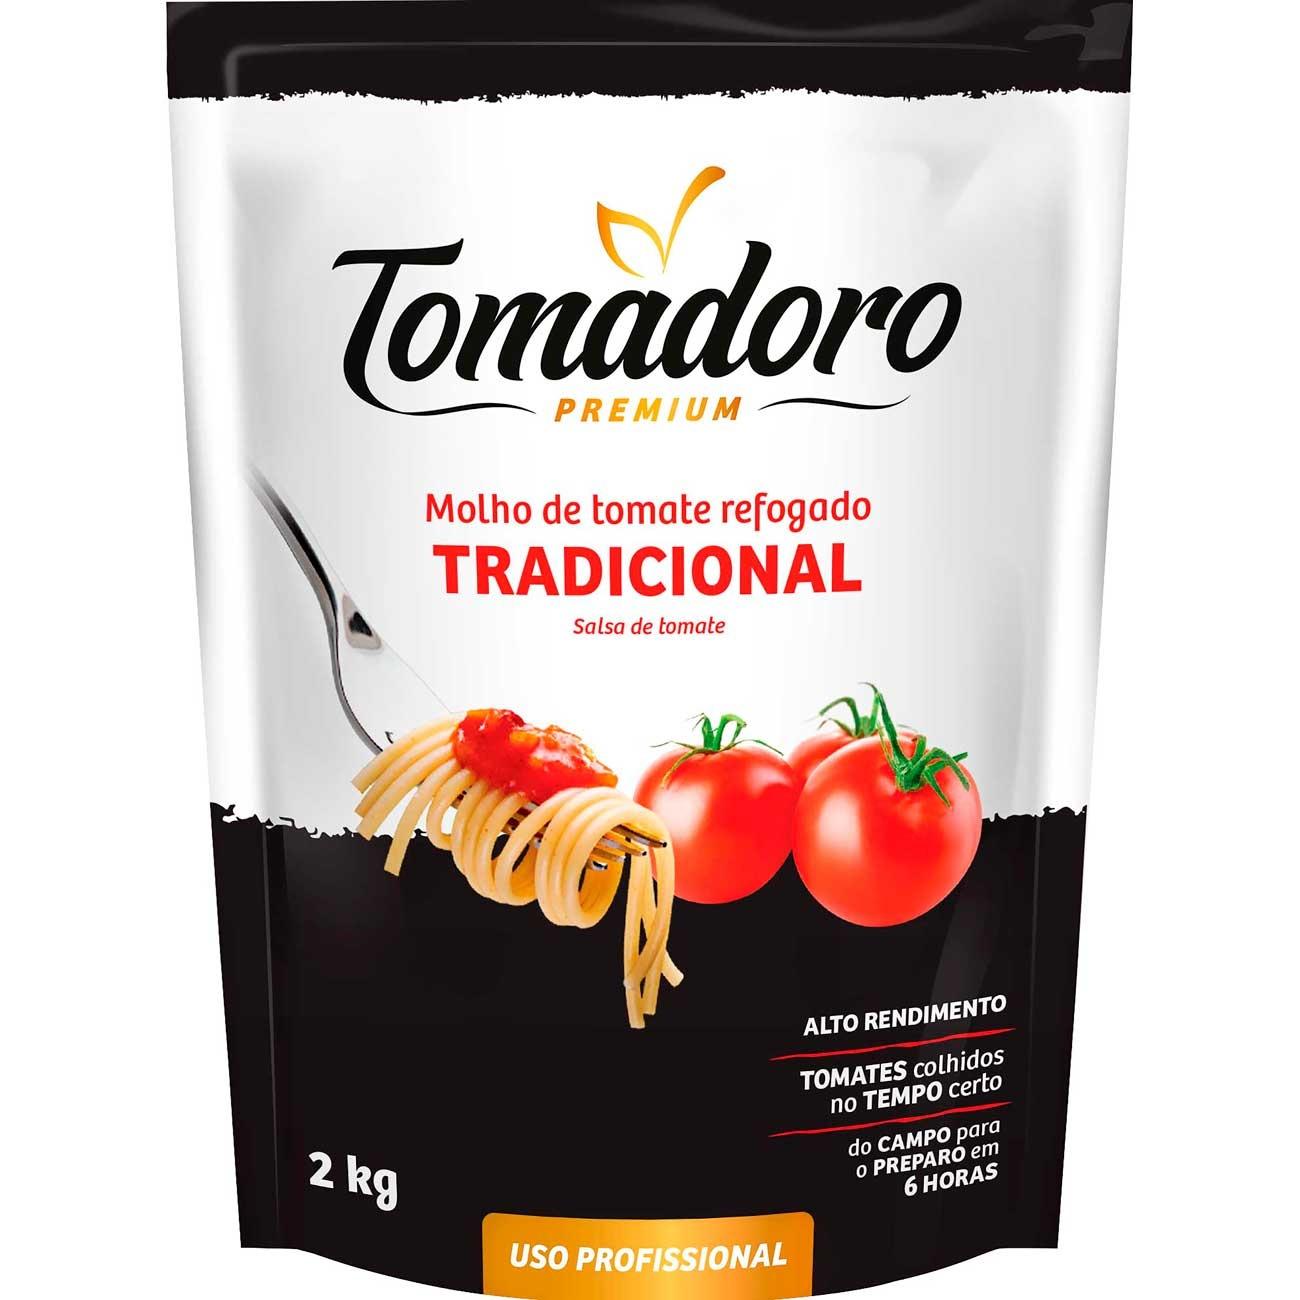 Molho De Tomate Tomadoro Premium Tradicional 2kg